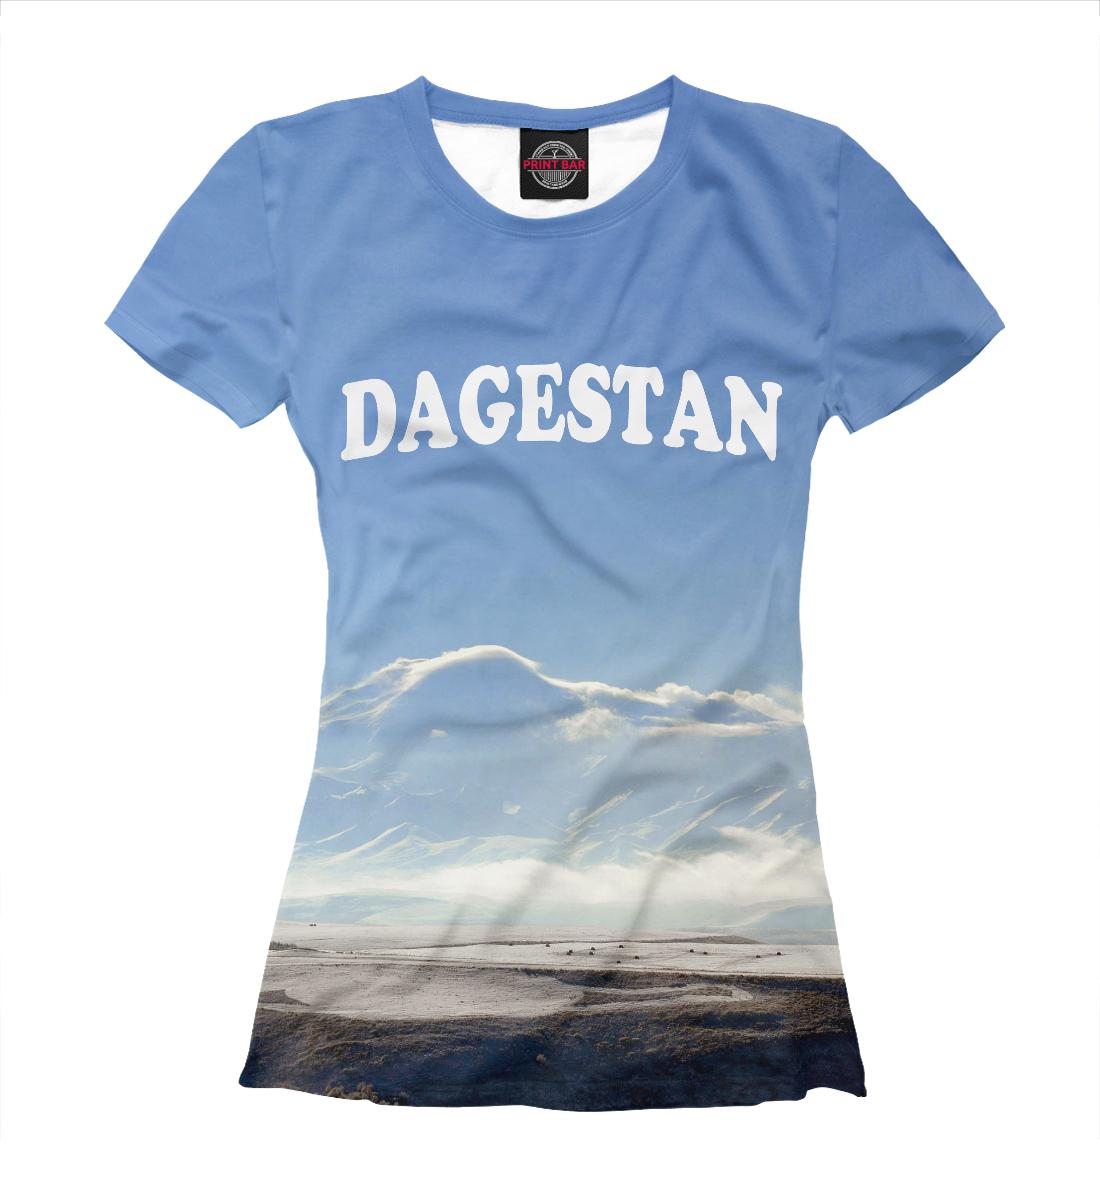 Купить Дагестан, Printbar, Футболки, VSY-253924-fut-1